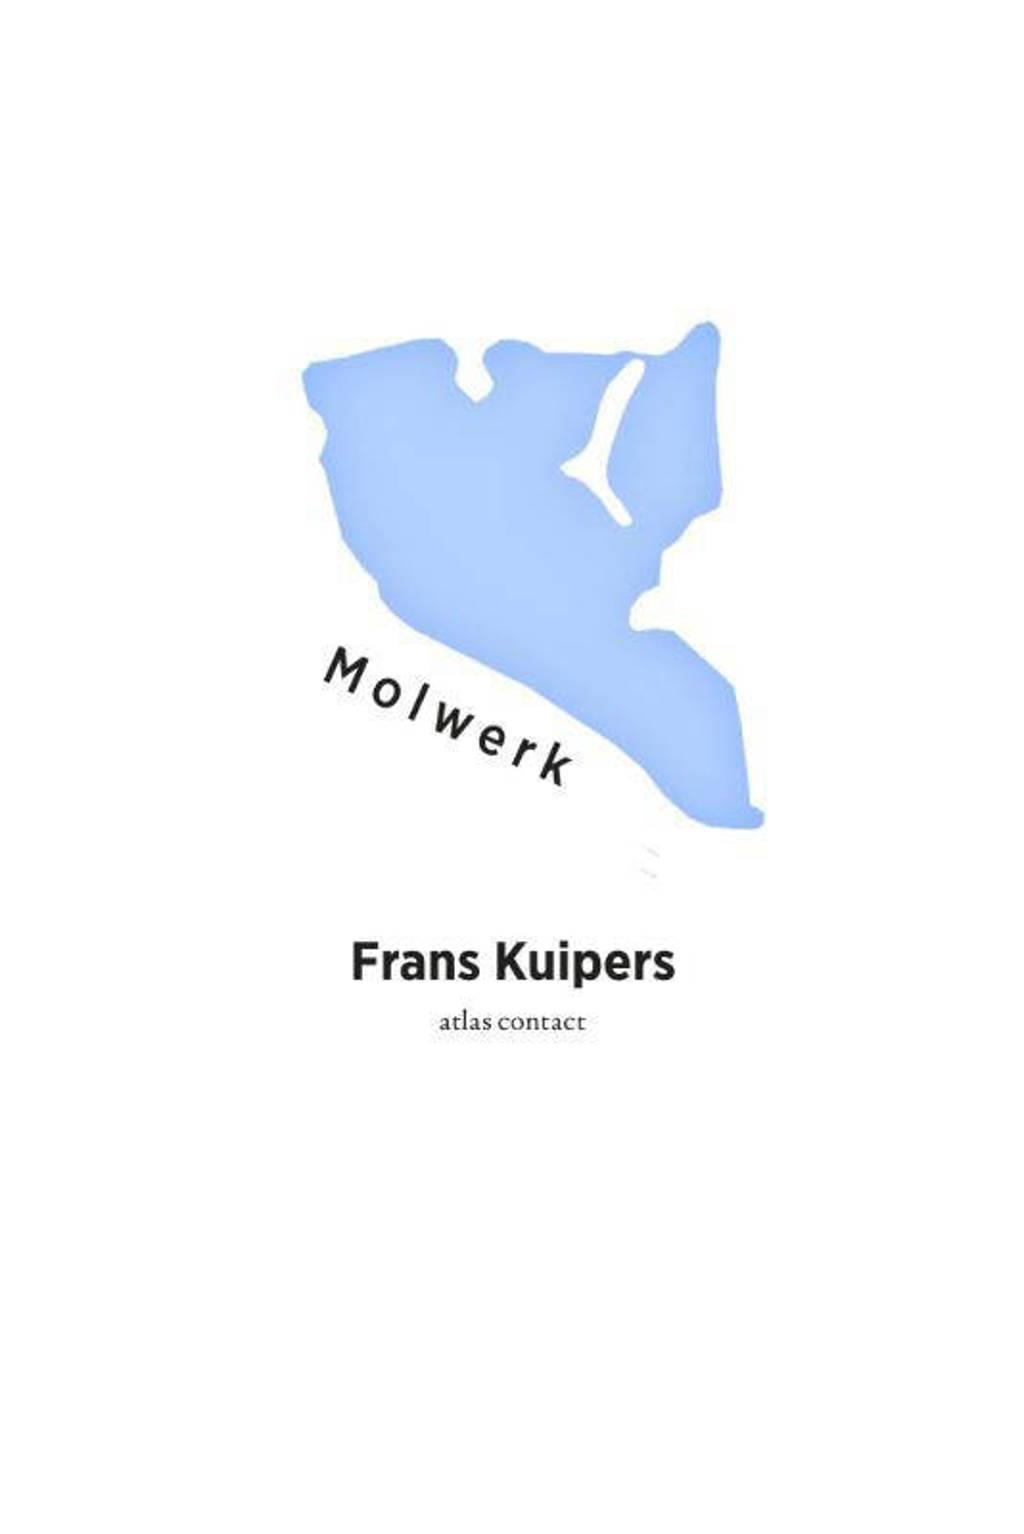 Molwerk - Frans Kuipers